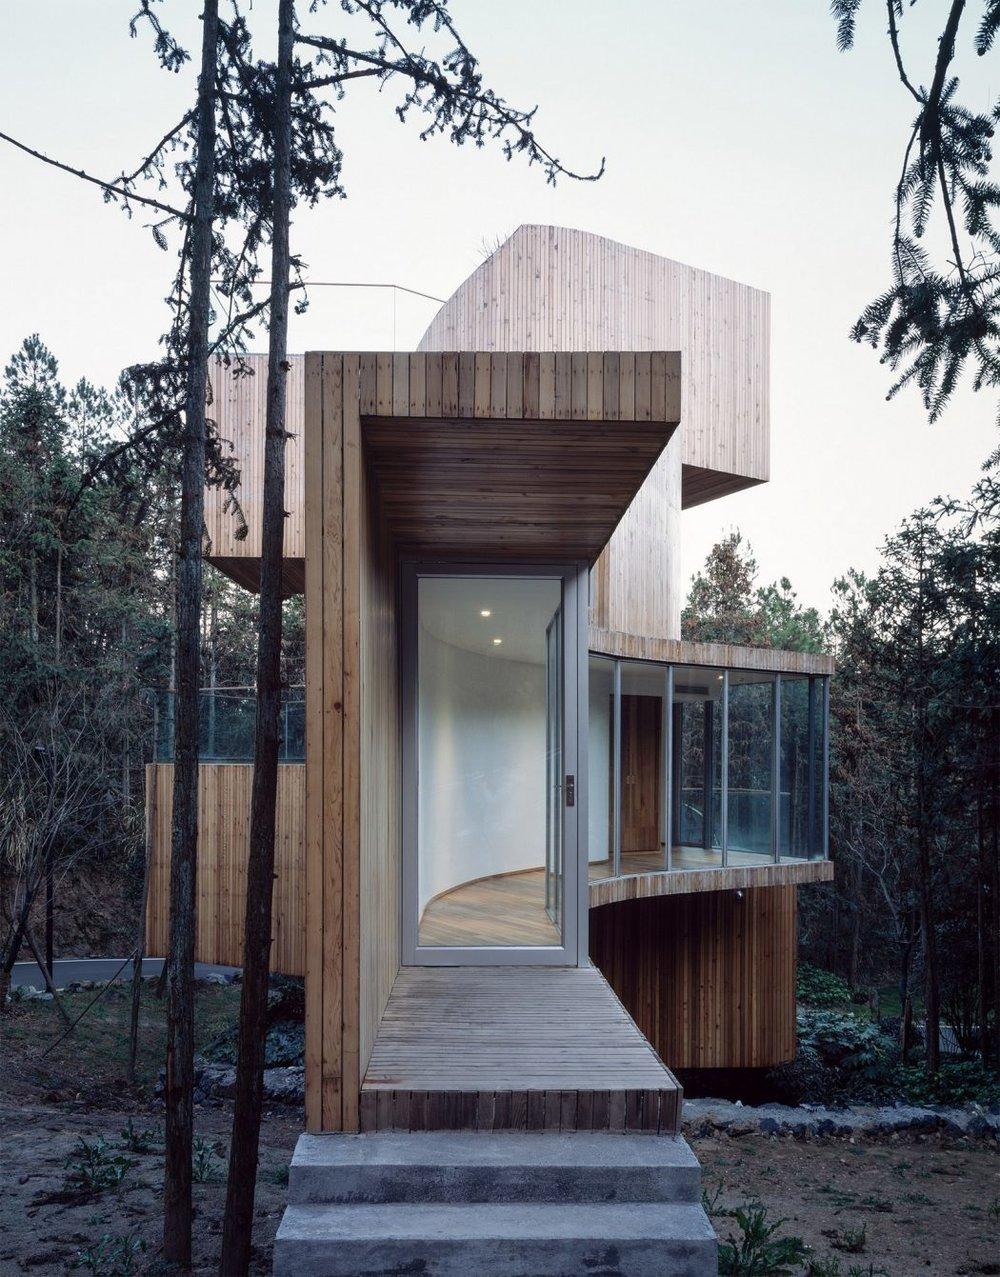 Bengo_Studio_Architecture-5-1050x1341.jpg